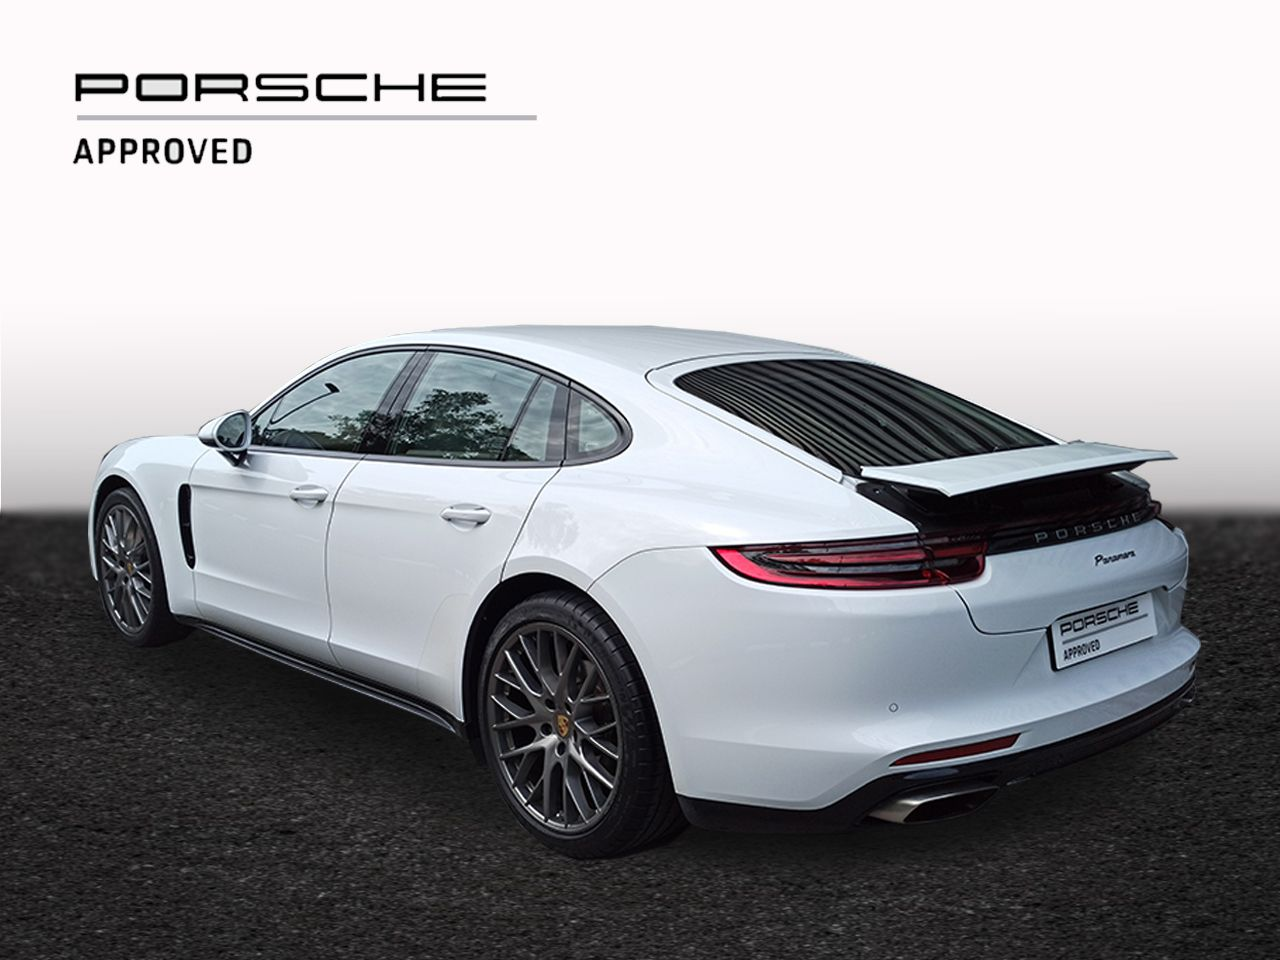 2017 Porsche Panamera – 2